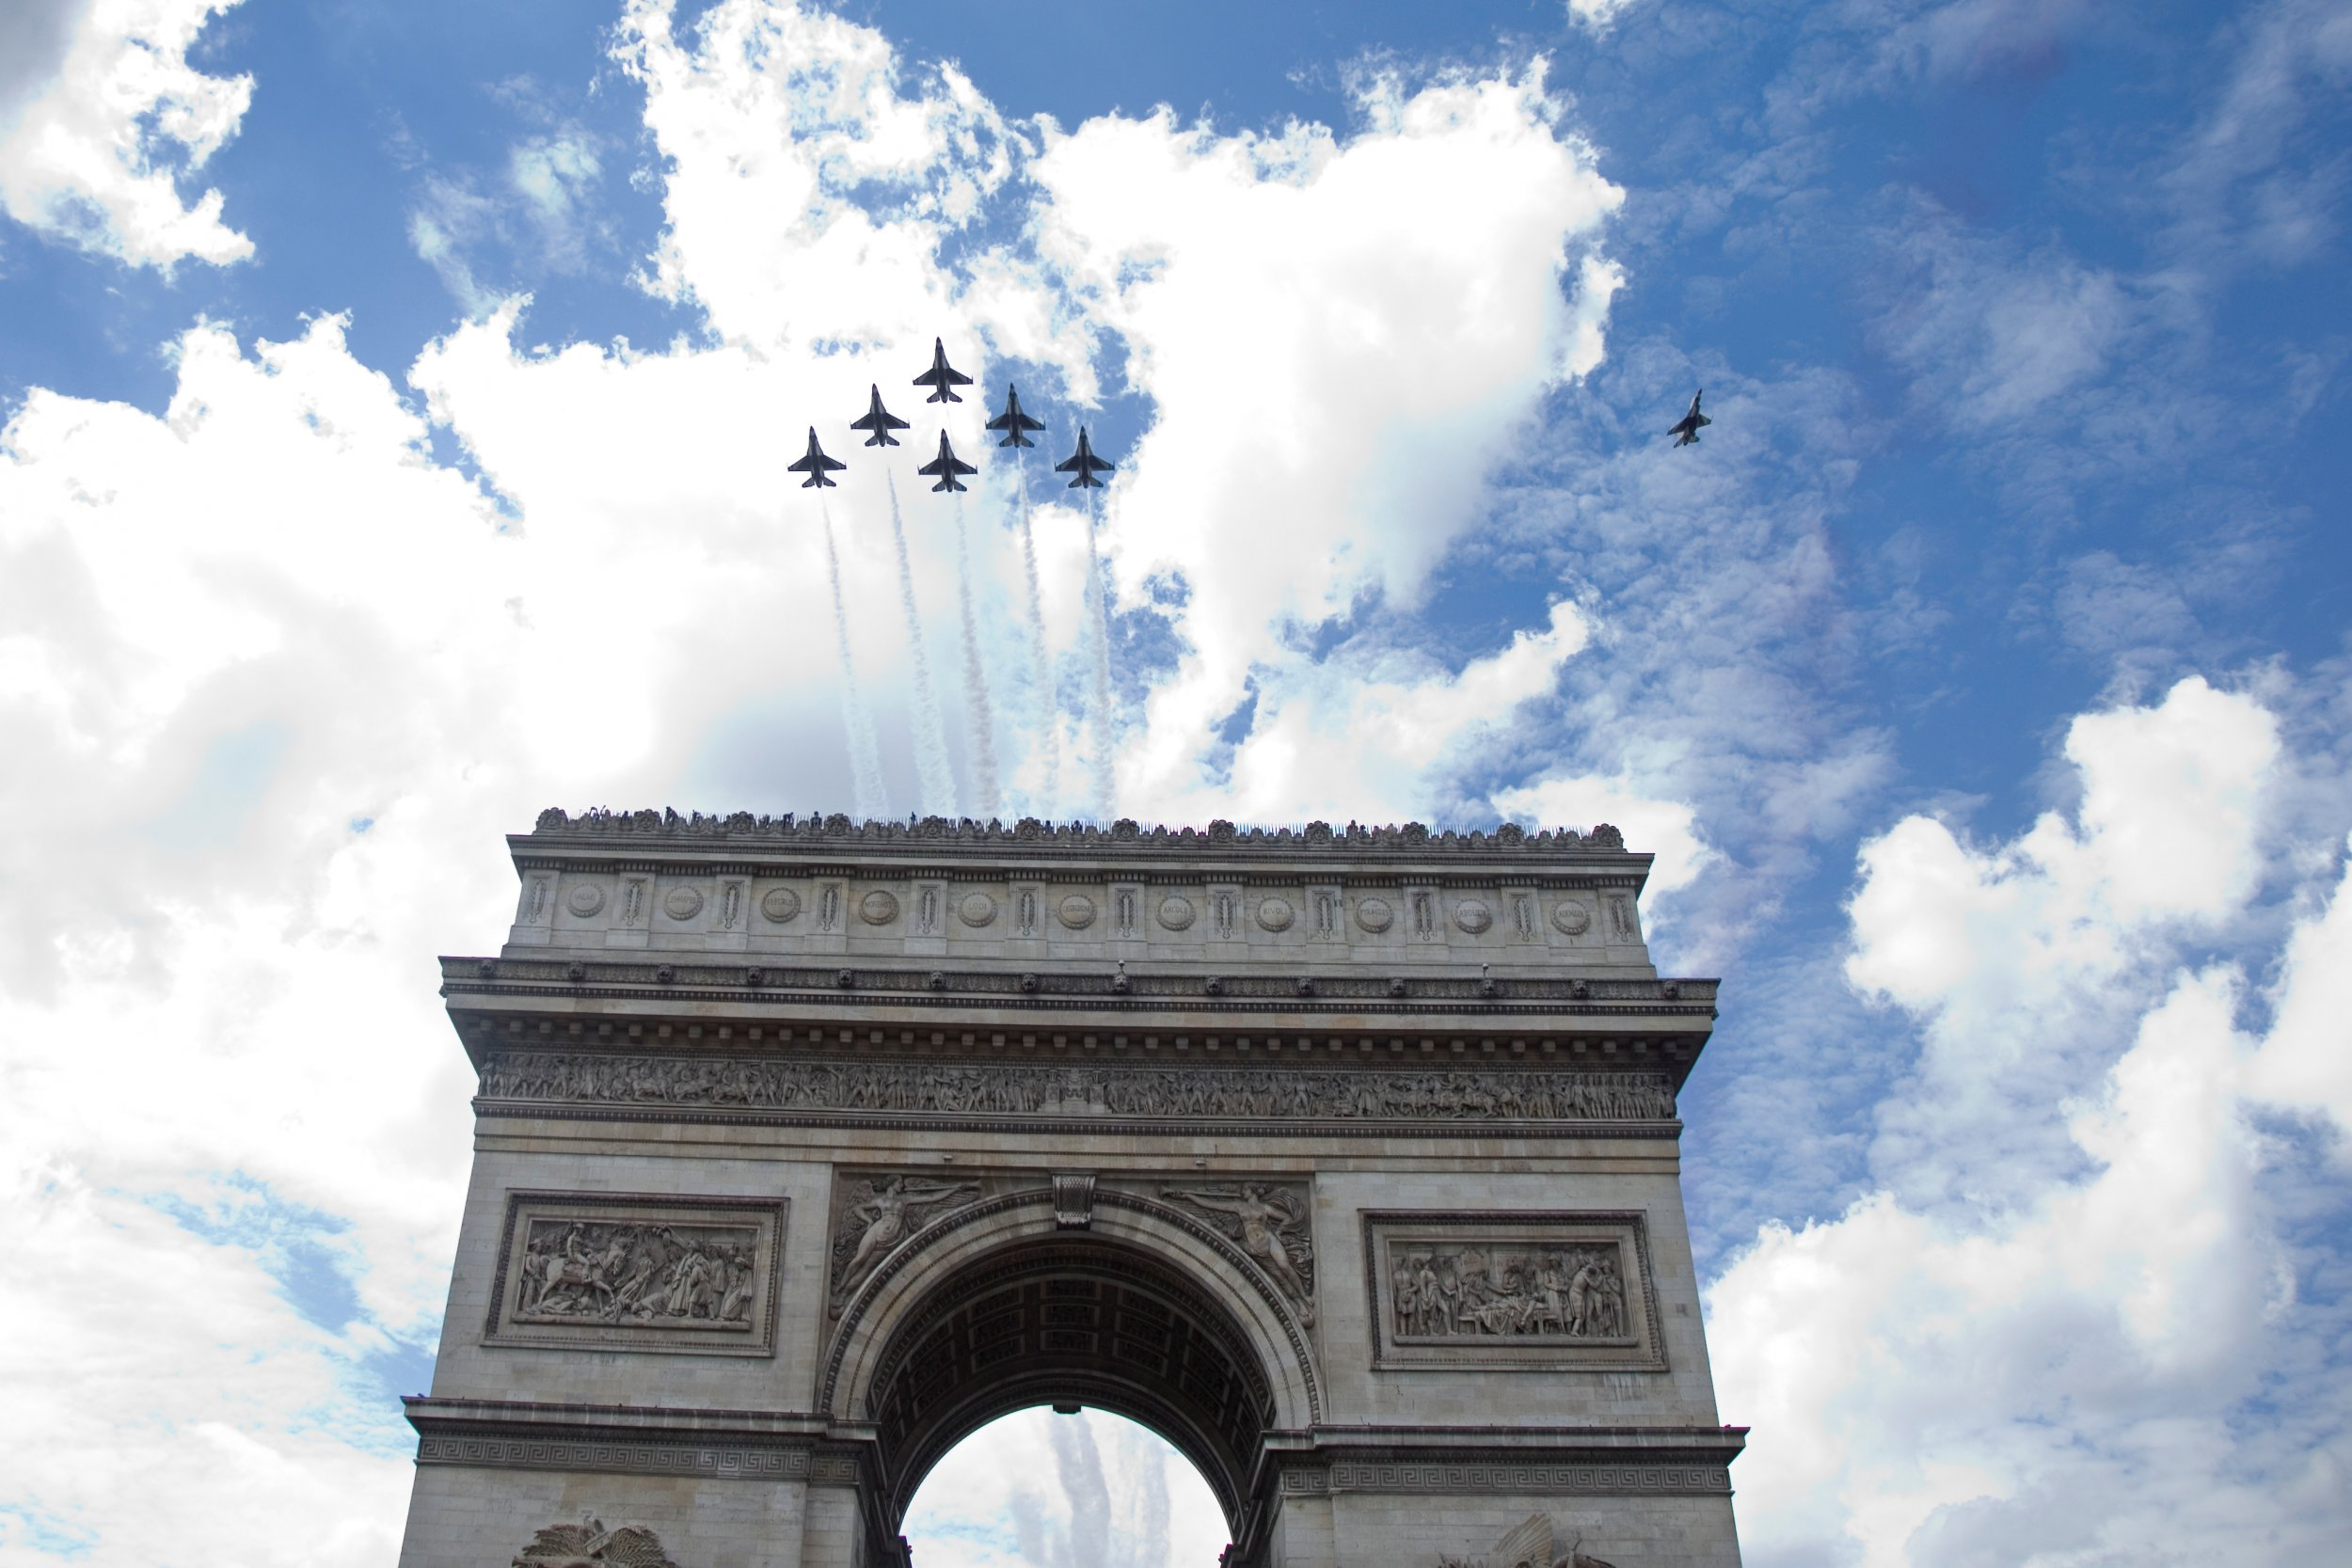 Bastille day U.S. Air Force